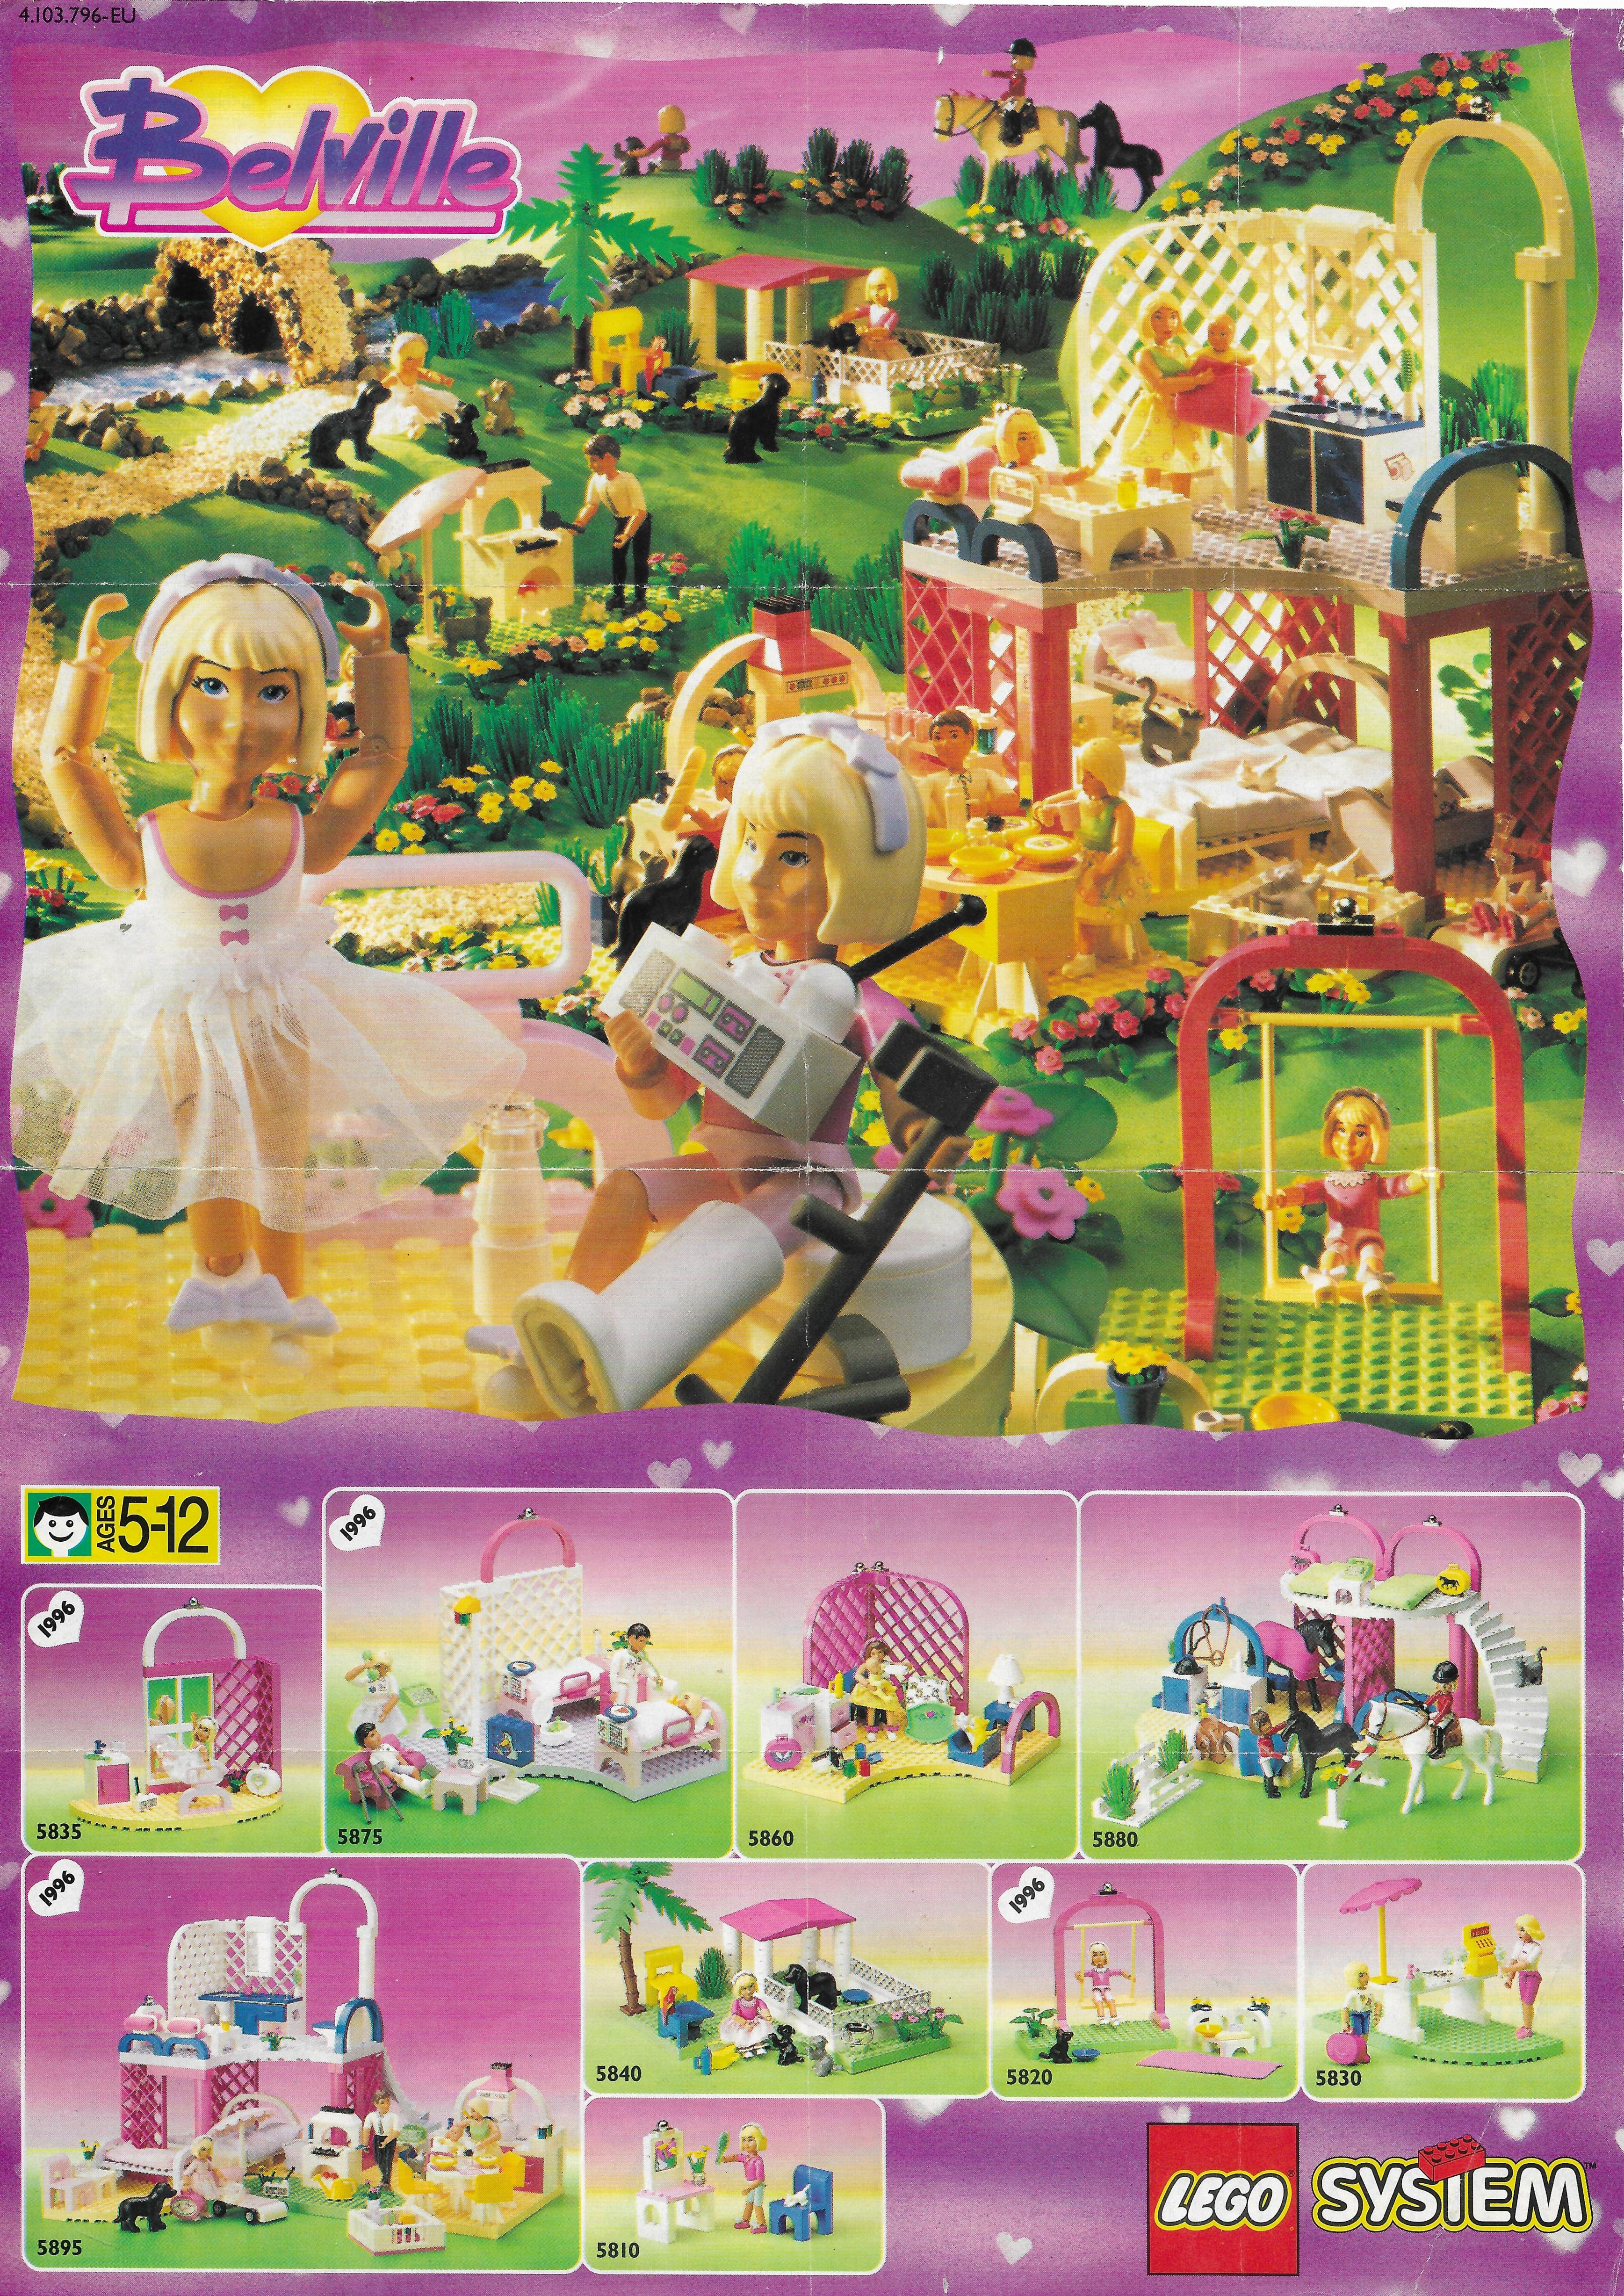 1996-os Lego Paradisa / Belville insert